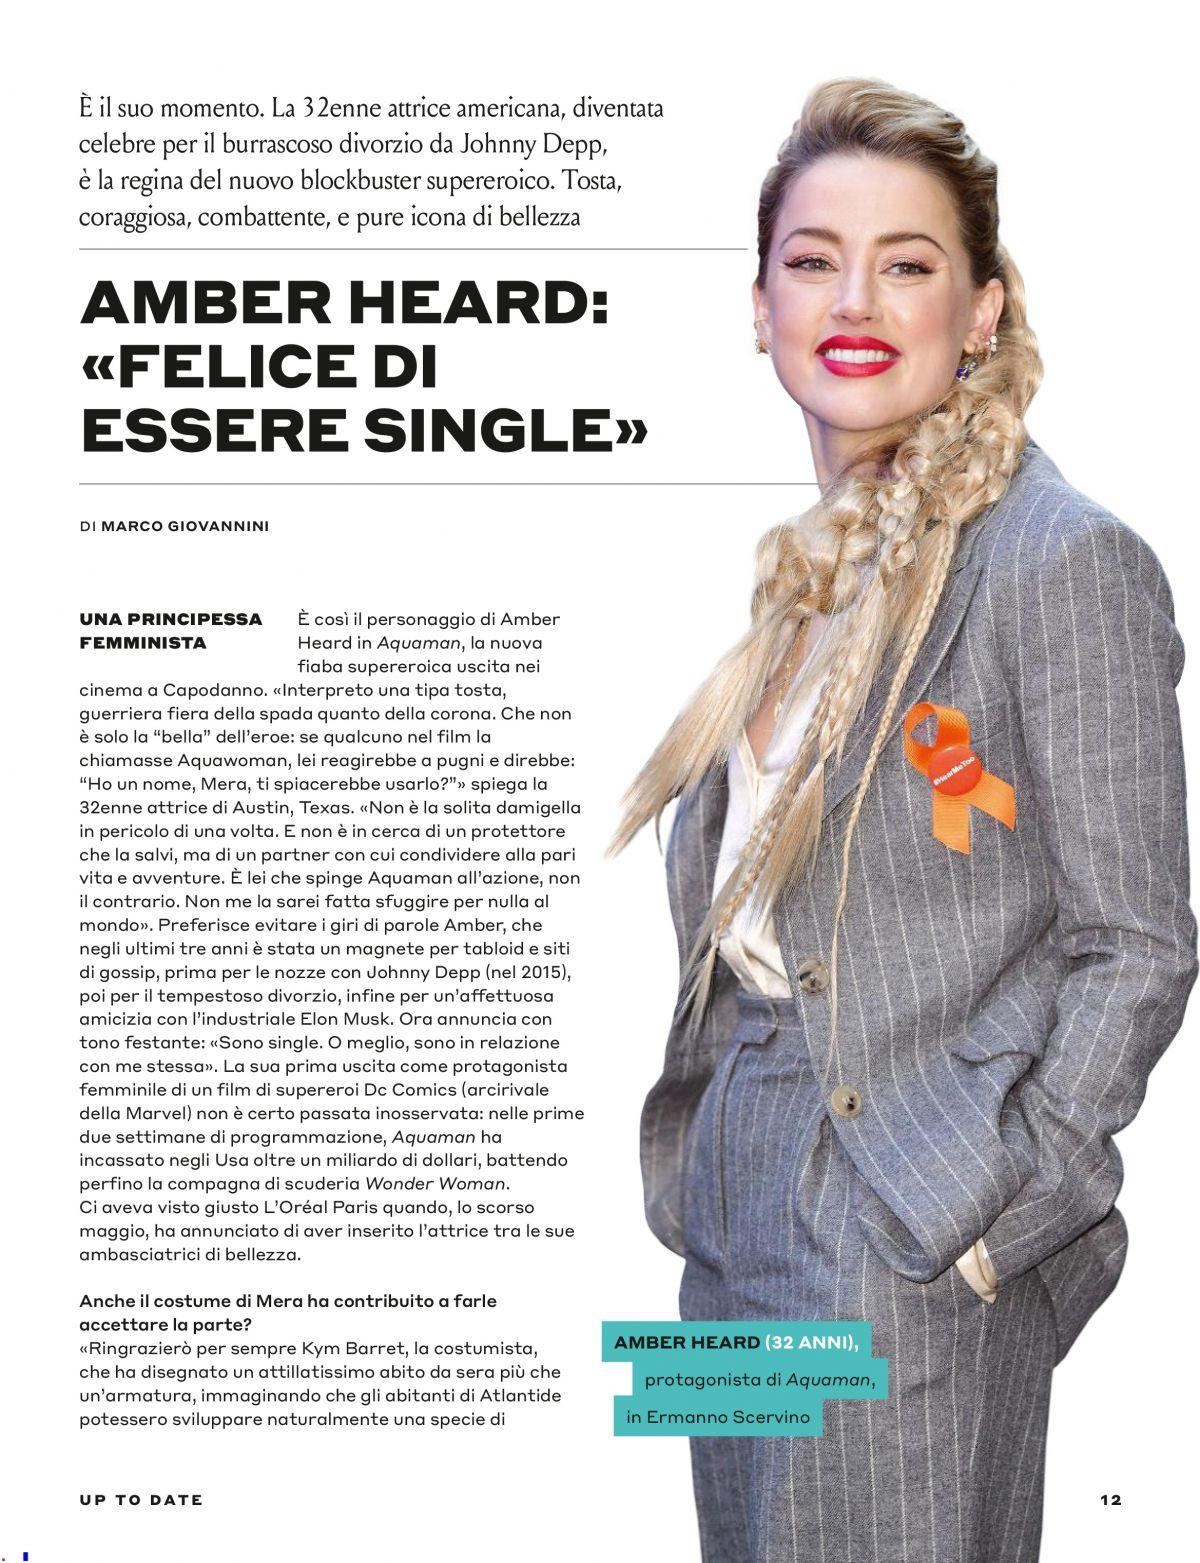 Tustyle Magazine November 2015 Issue: AMBER HEARD In Tu Style Magazine, January 2019